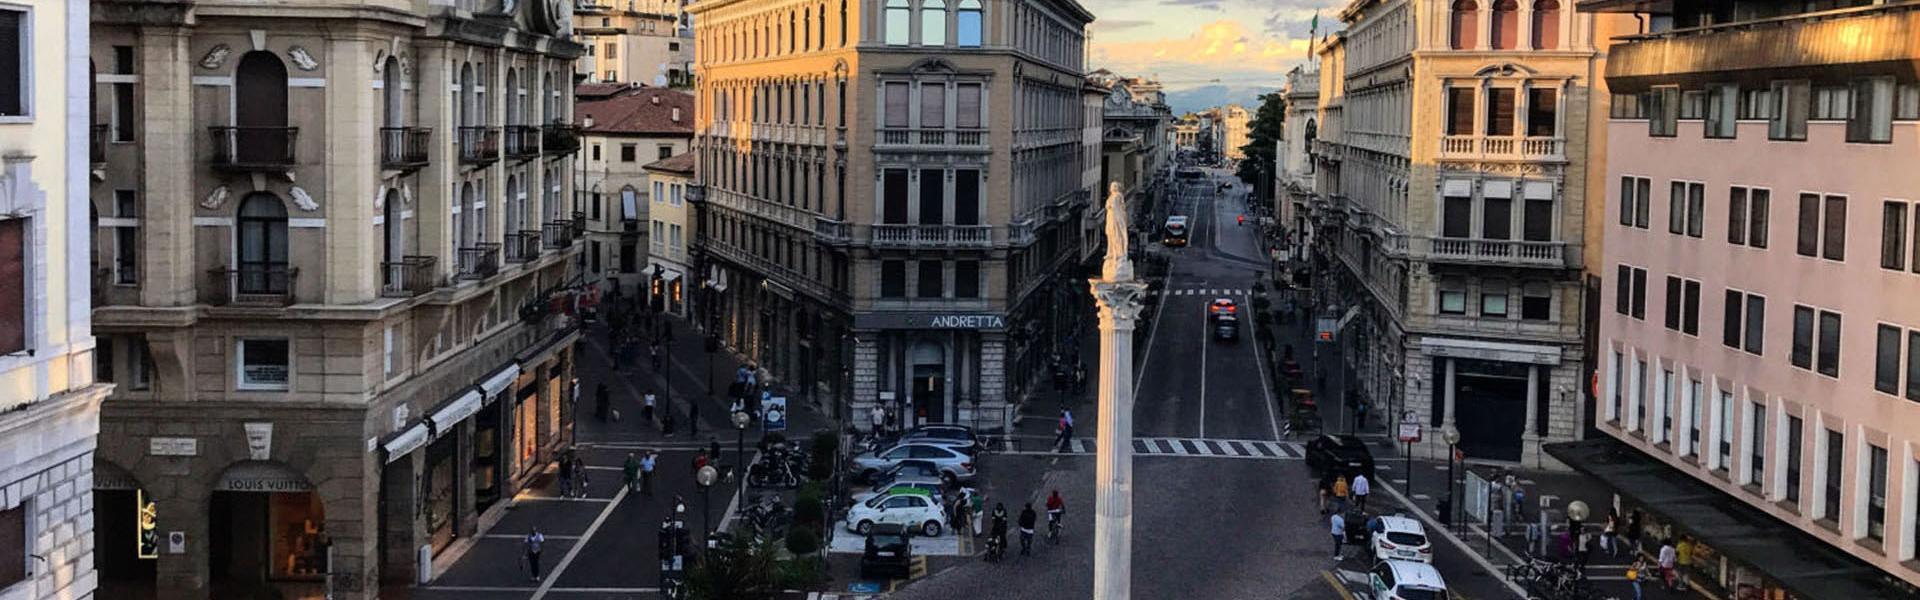 Padova Travel Weekend ©Antonella Ruzzante